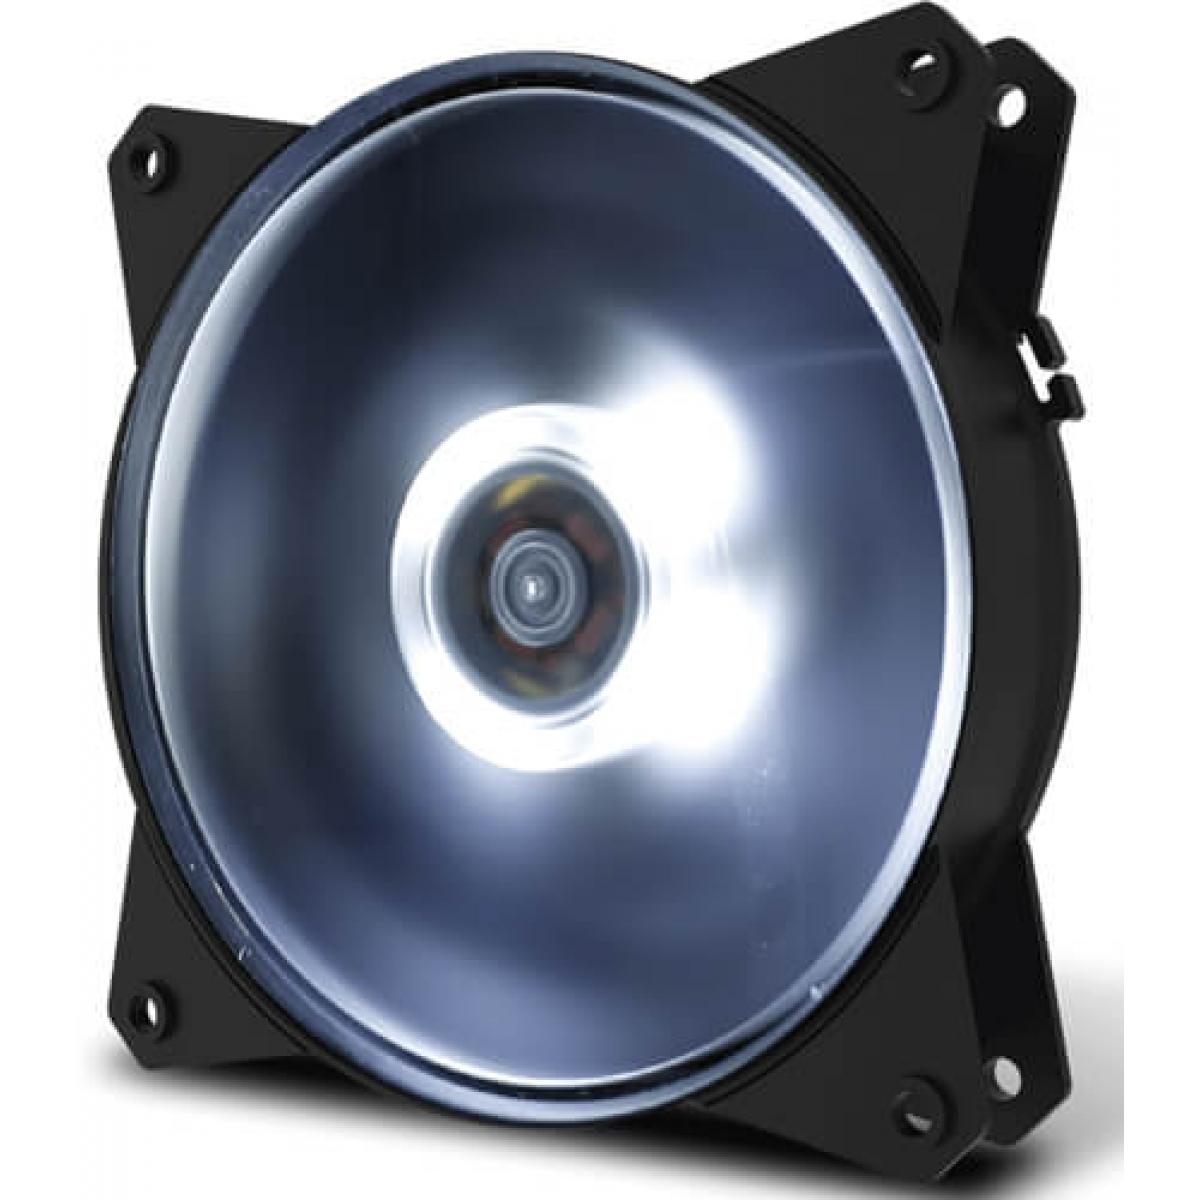 Cooler Para Gabinete Cooler Master MasterFan MF120L, LED White 120mm, R4-C1DS-12FW-R1